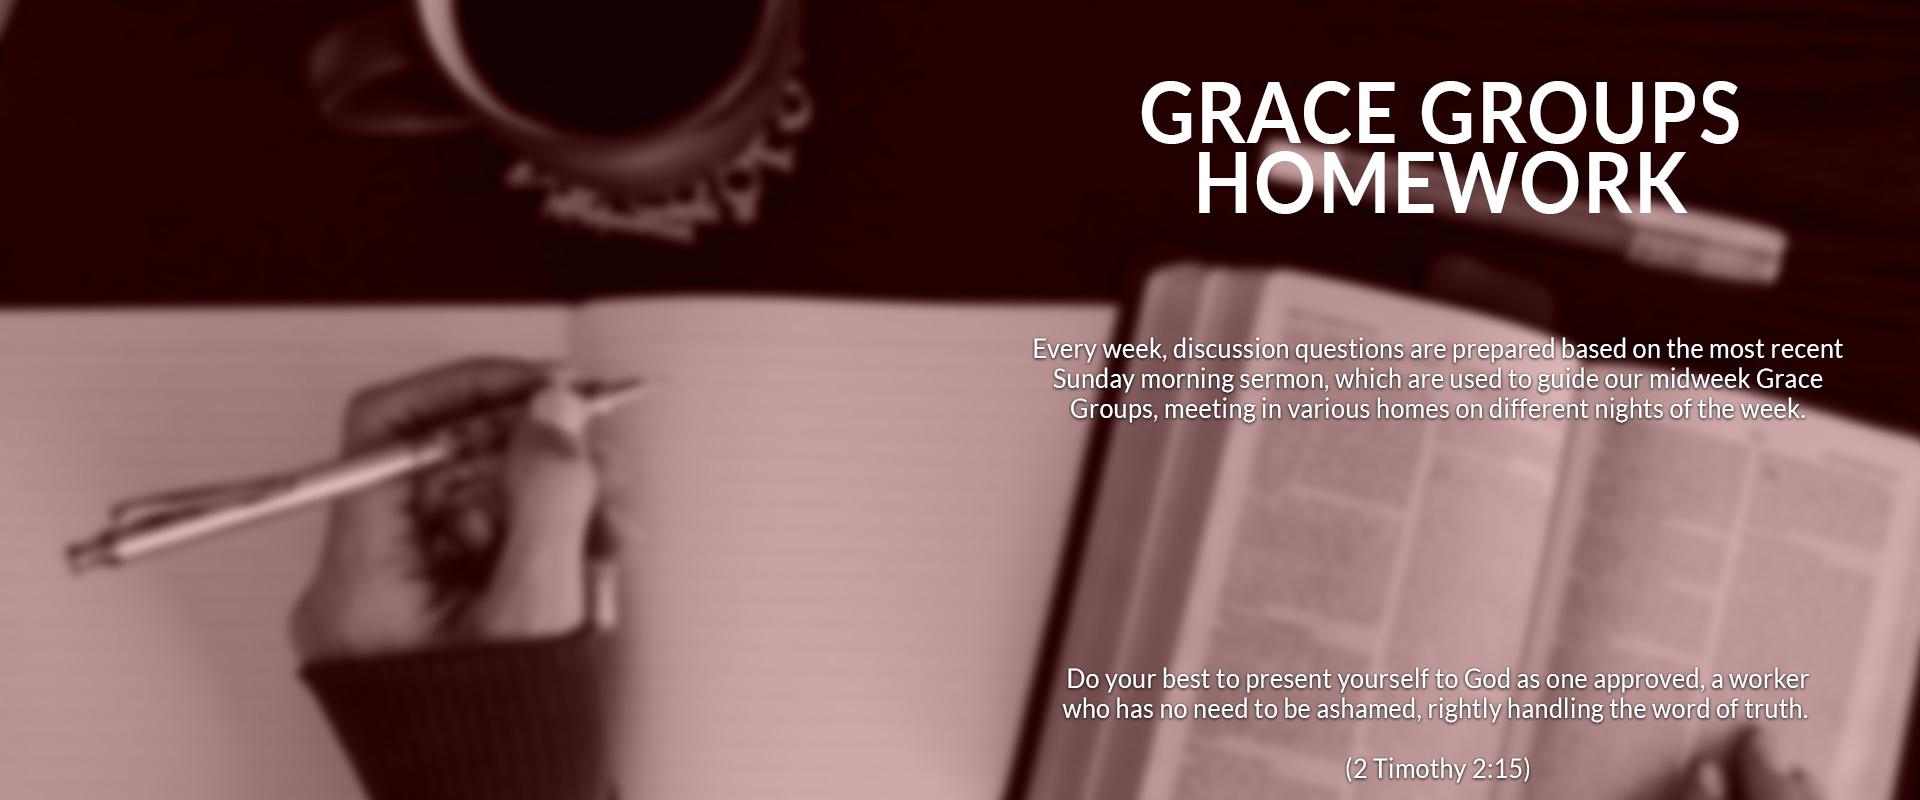 Grace Groups Homework